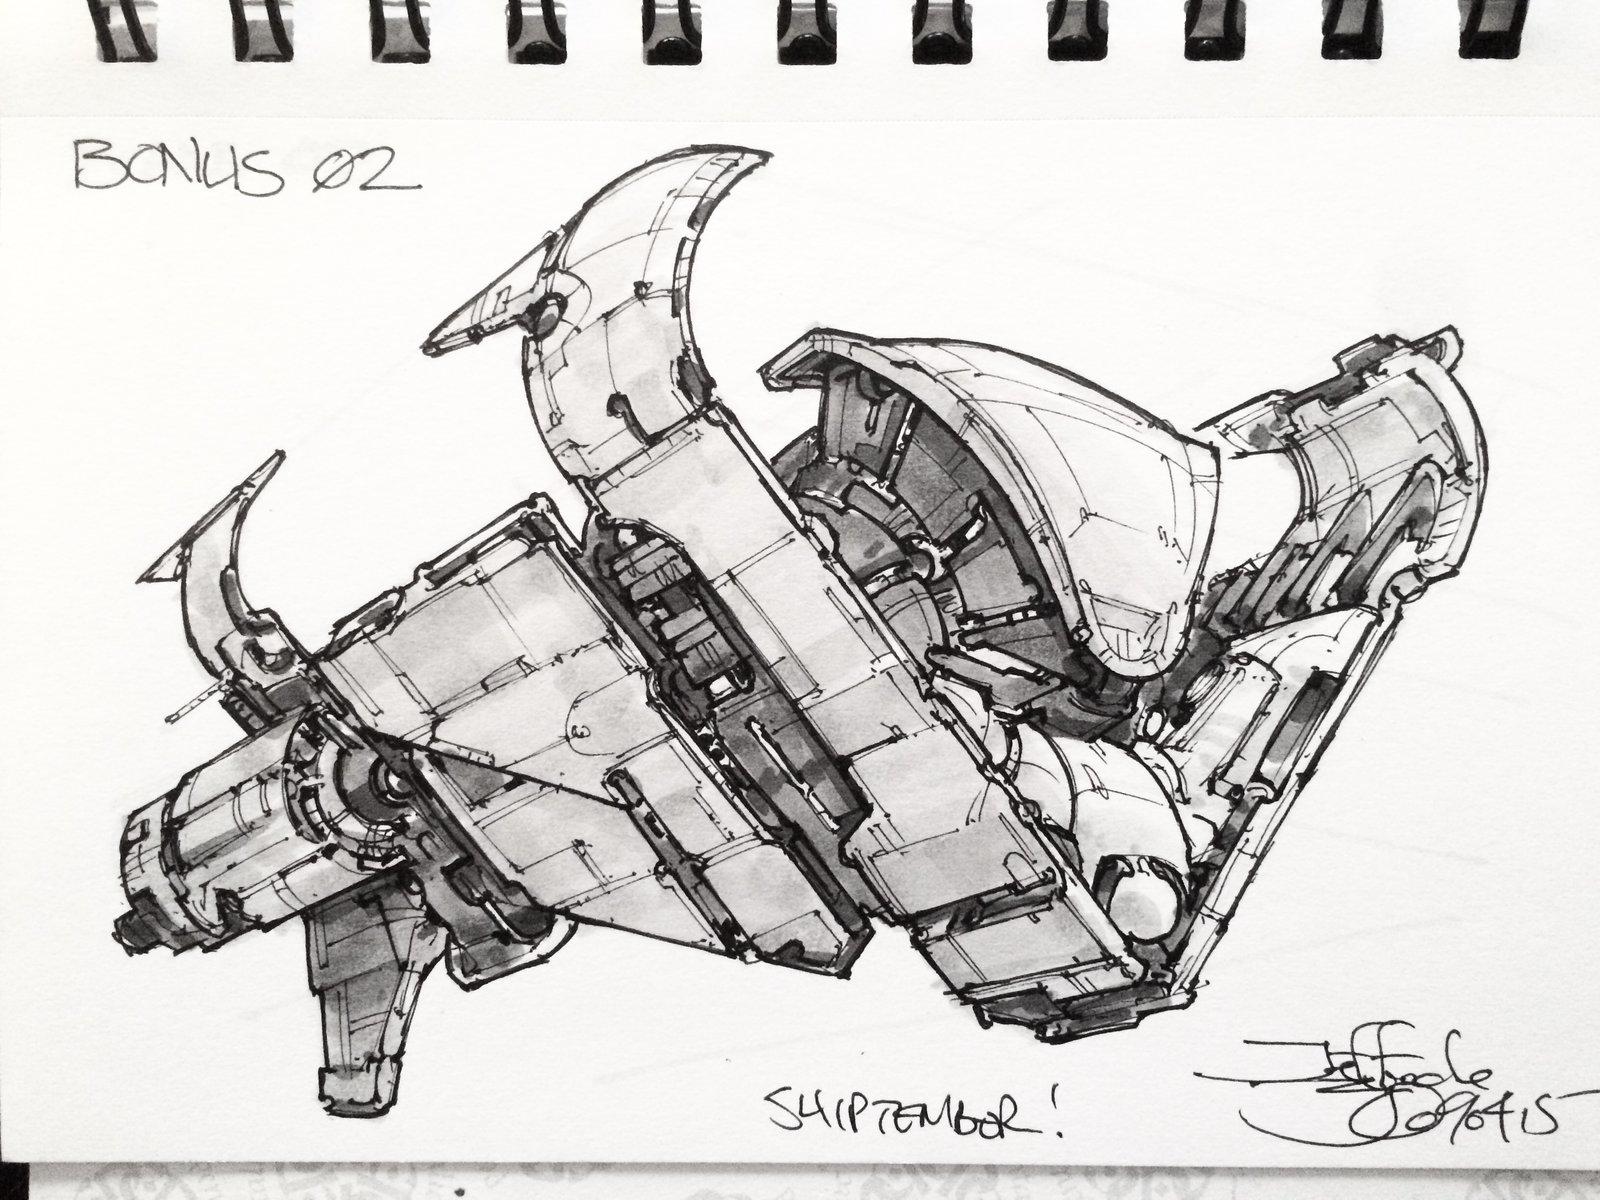 Shiptember Bonus 02